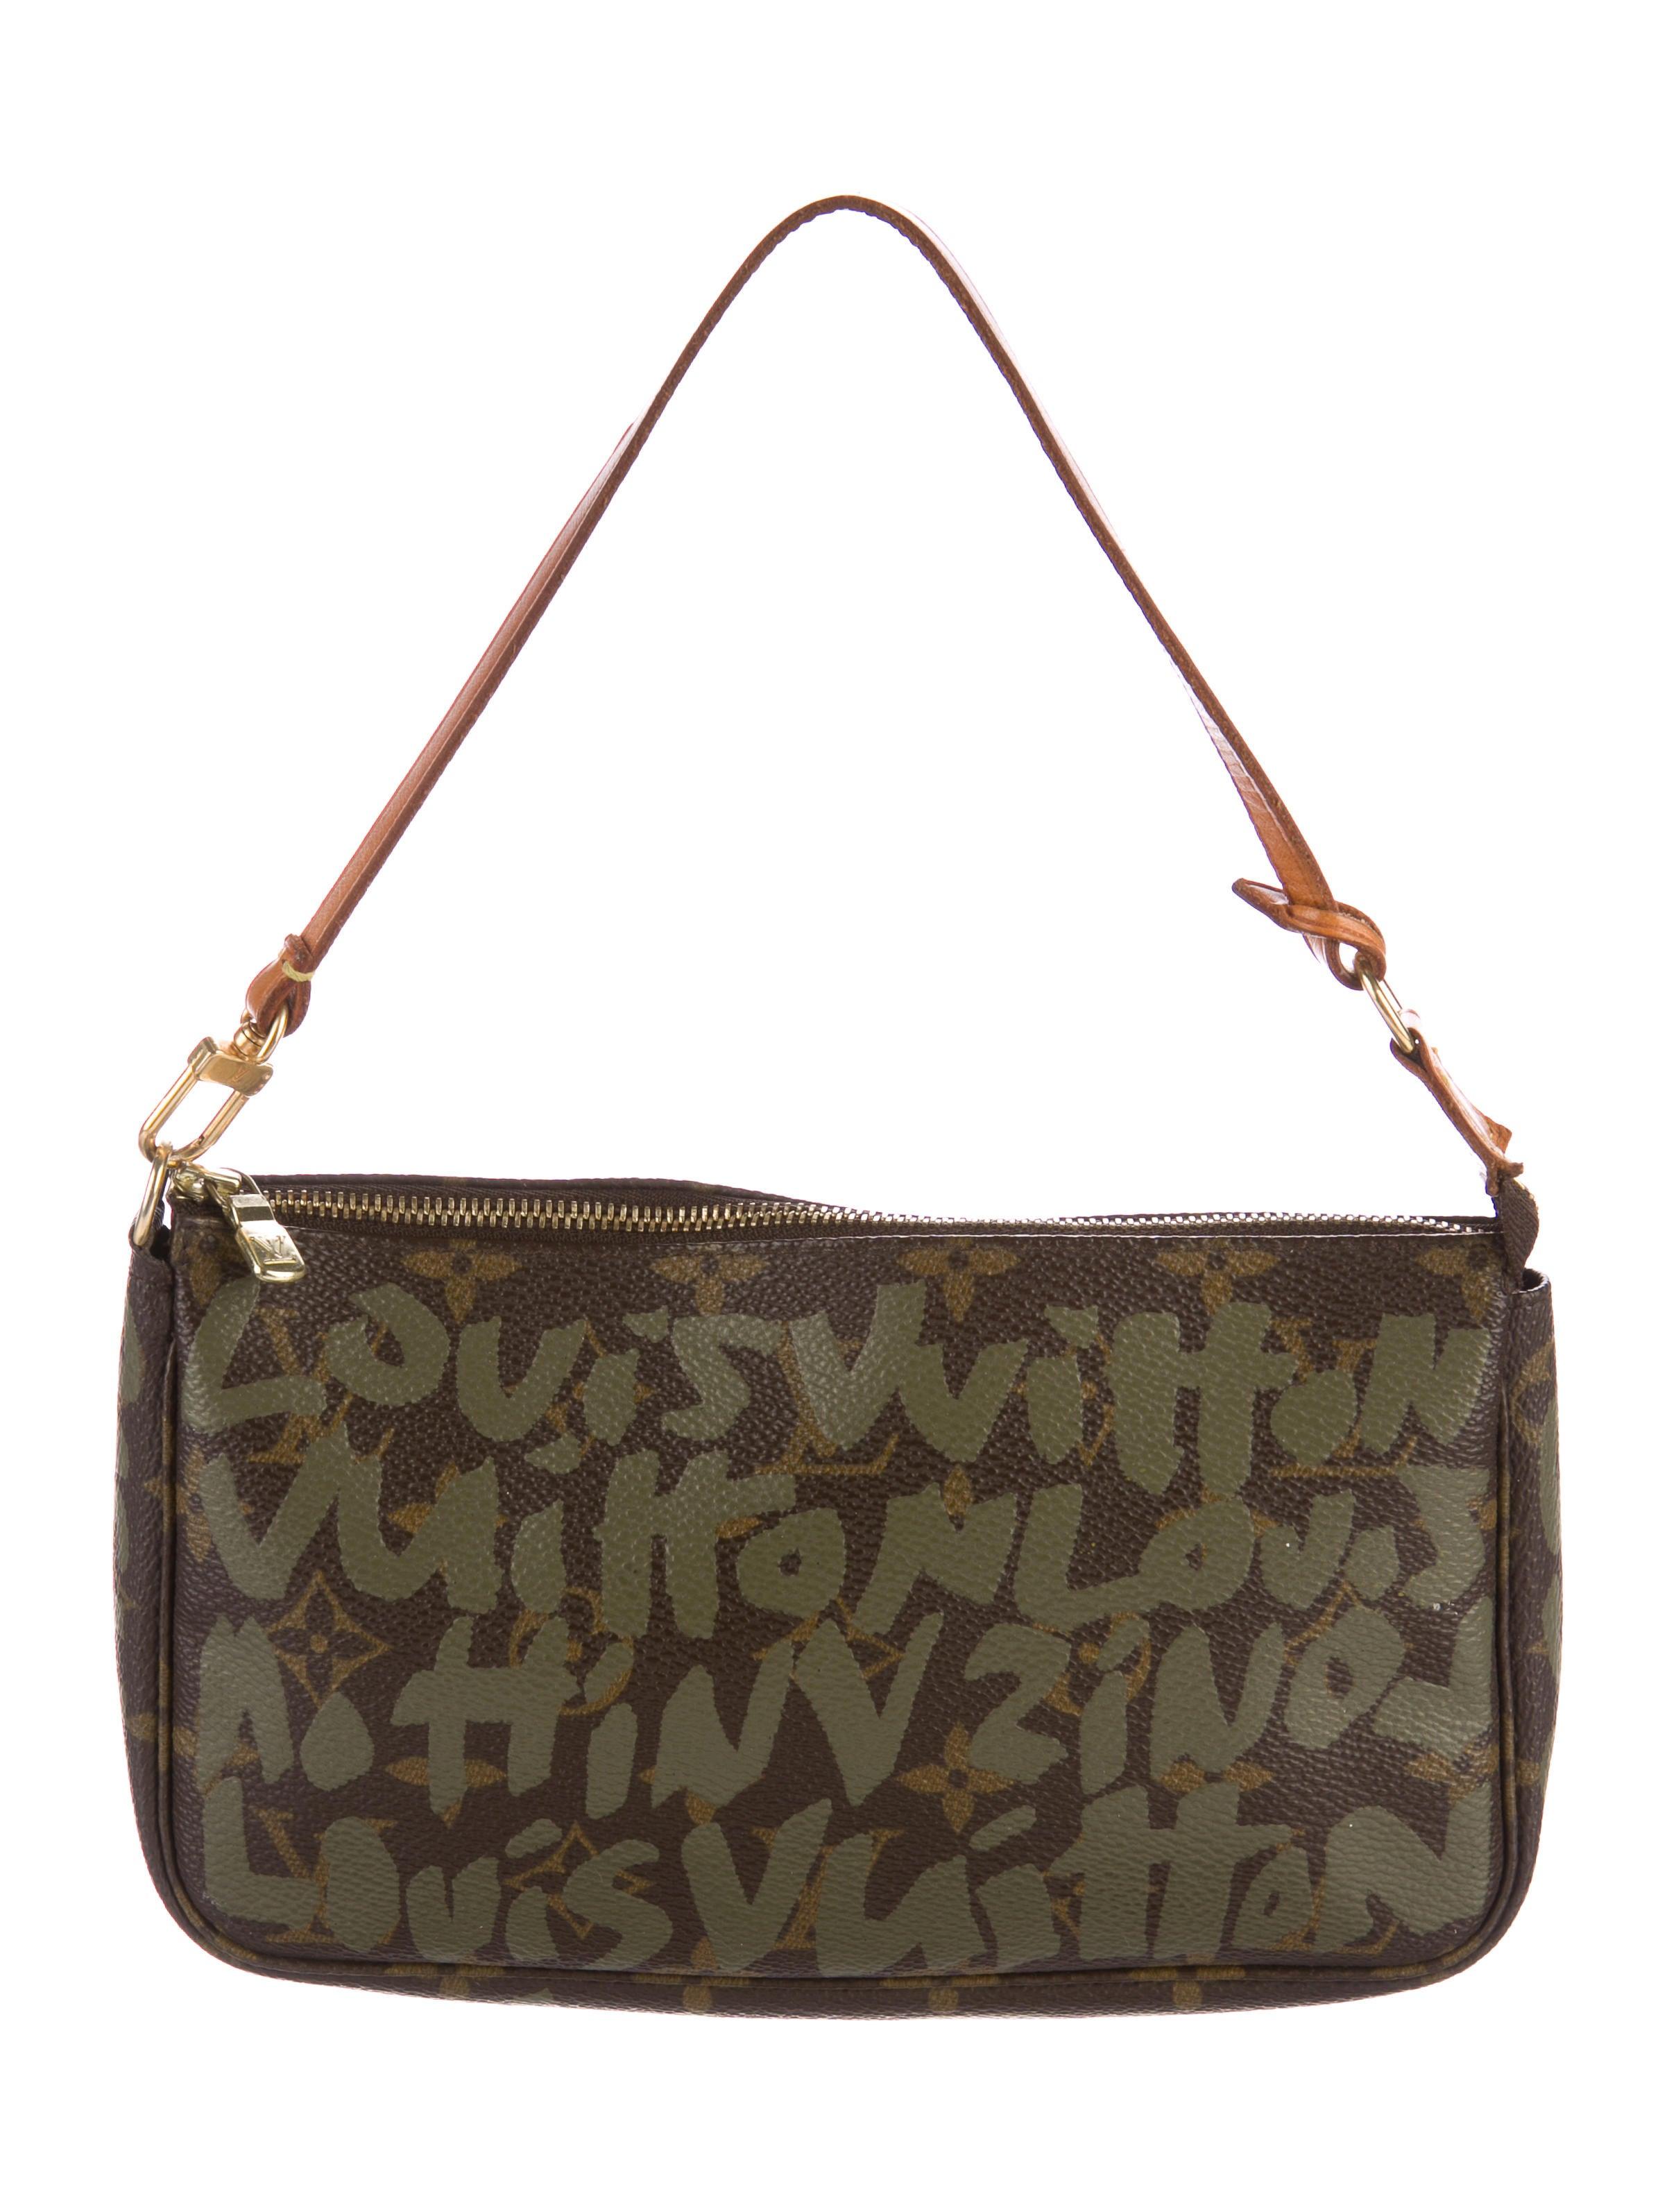 louis vuitton graffiti pochette accessoires handbags. Black Bedroom Furniture Sets. Home Design Ideas